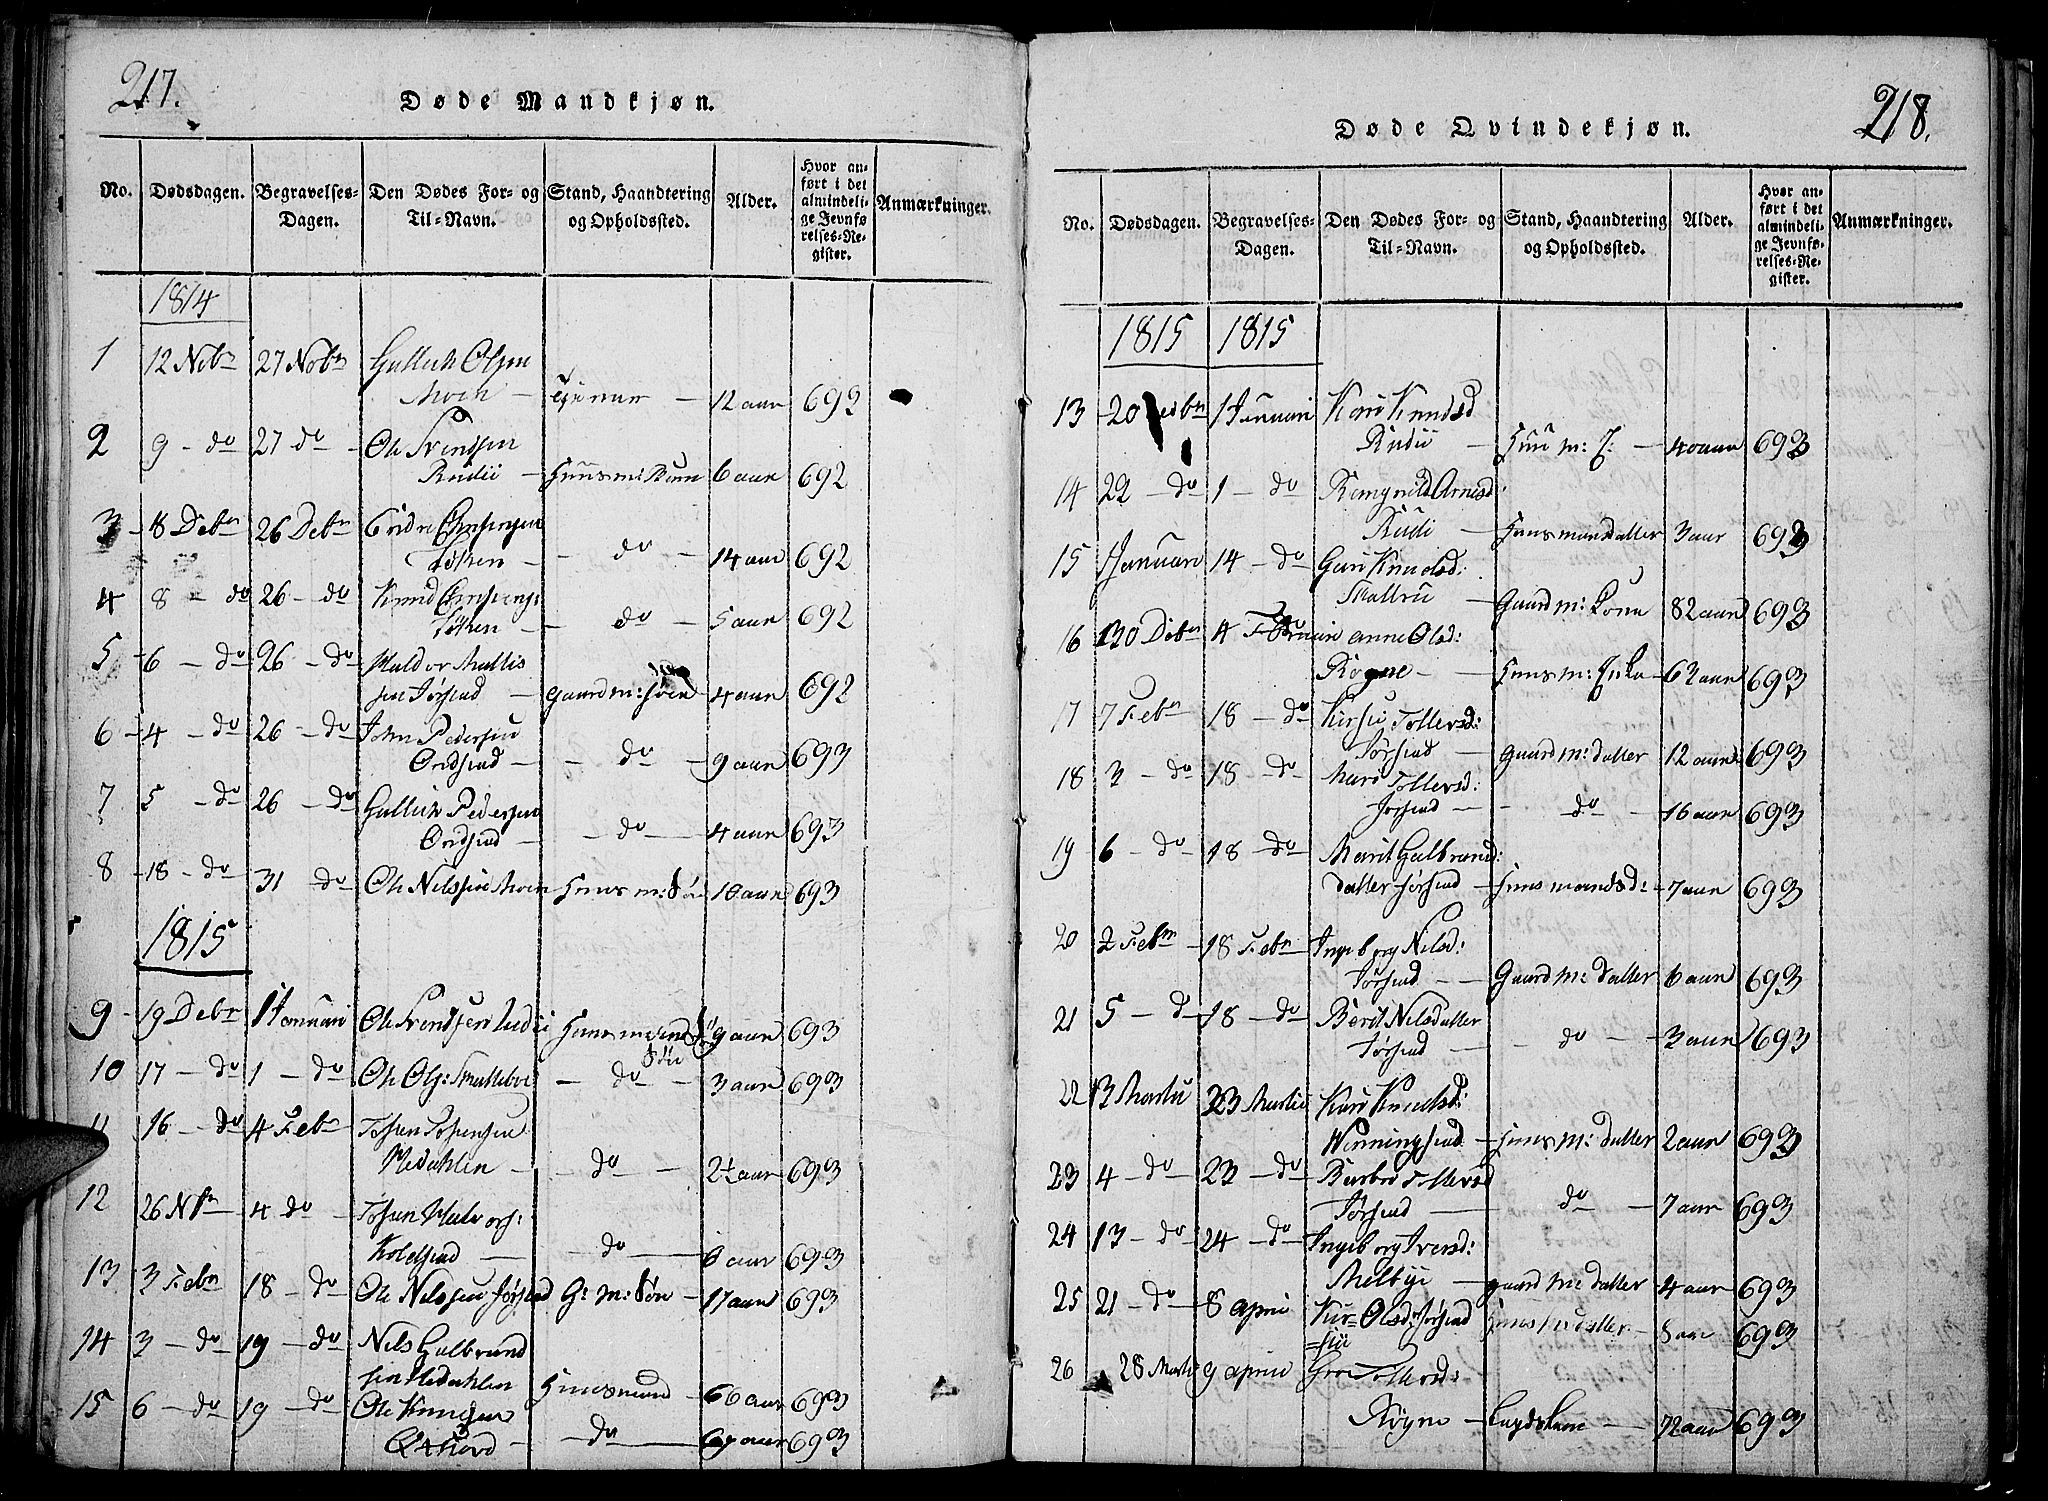 SAH, Slidre prestekontor, Klokkerbok nr. 2, 1814-1839, s. 217-218